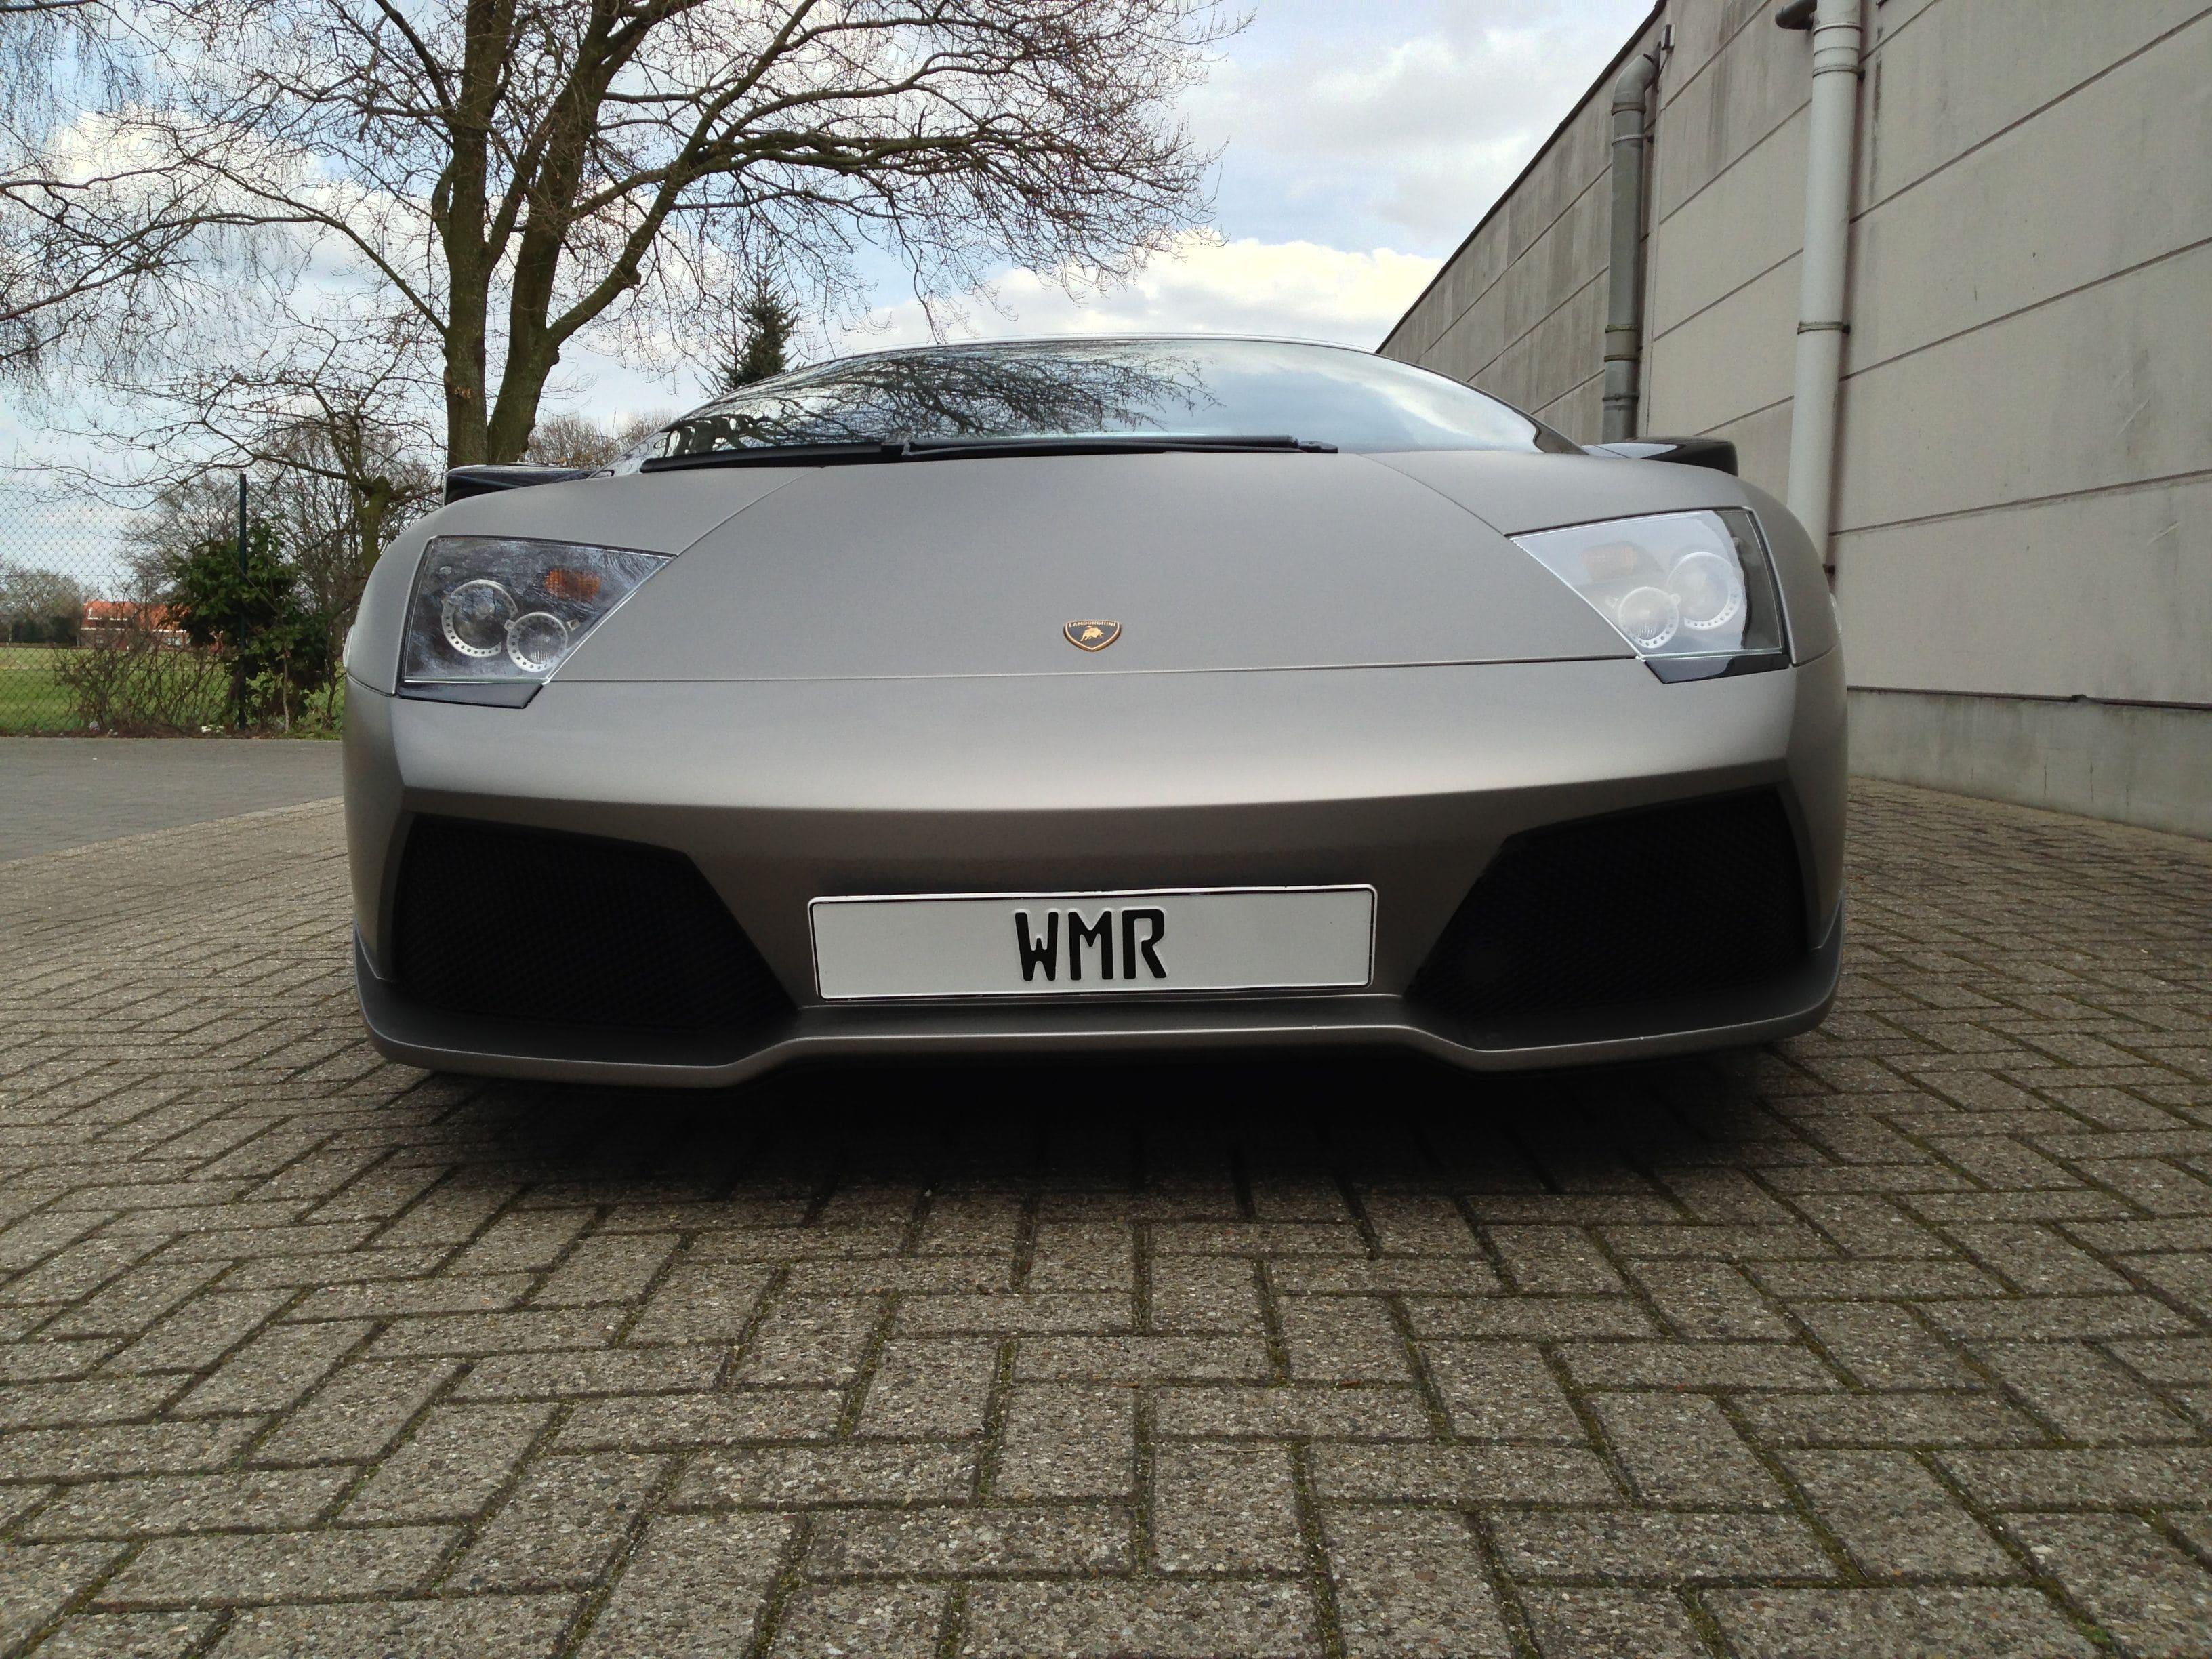 Lamborghini Murcialago LP670 met Gunpowder Wrap, Carwrapping door Wrapmyride.nu Foto-nr:5972, ©2021